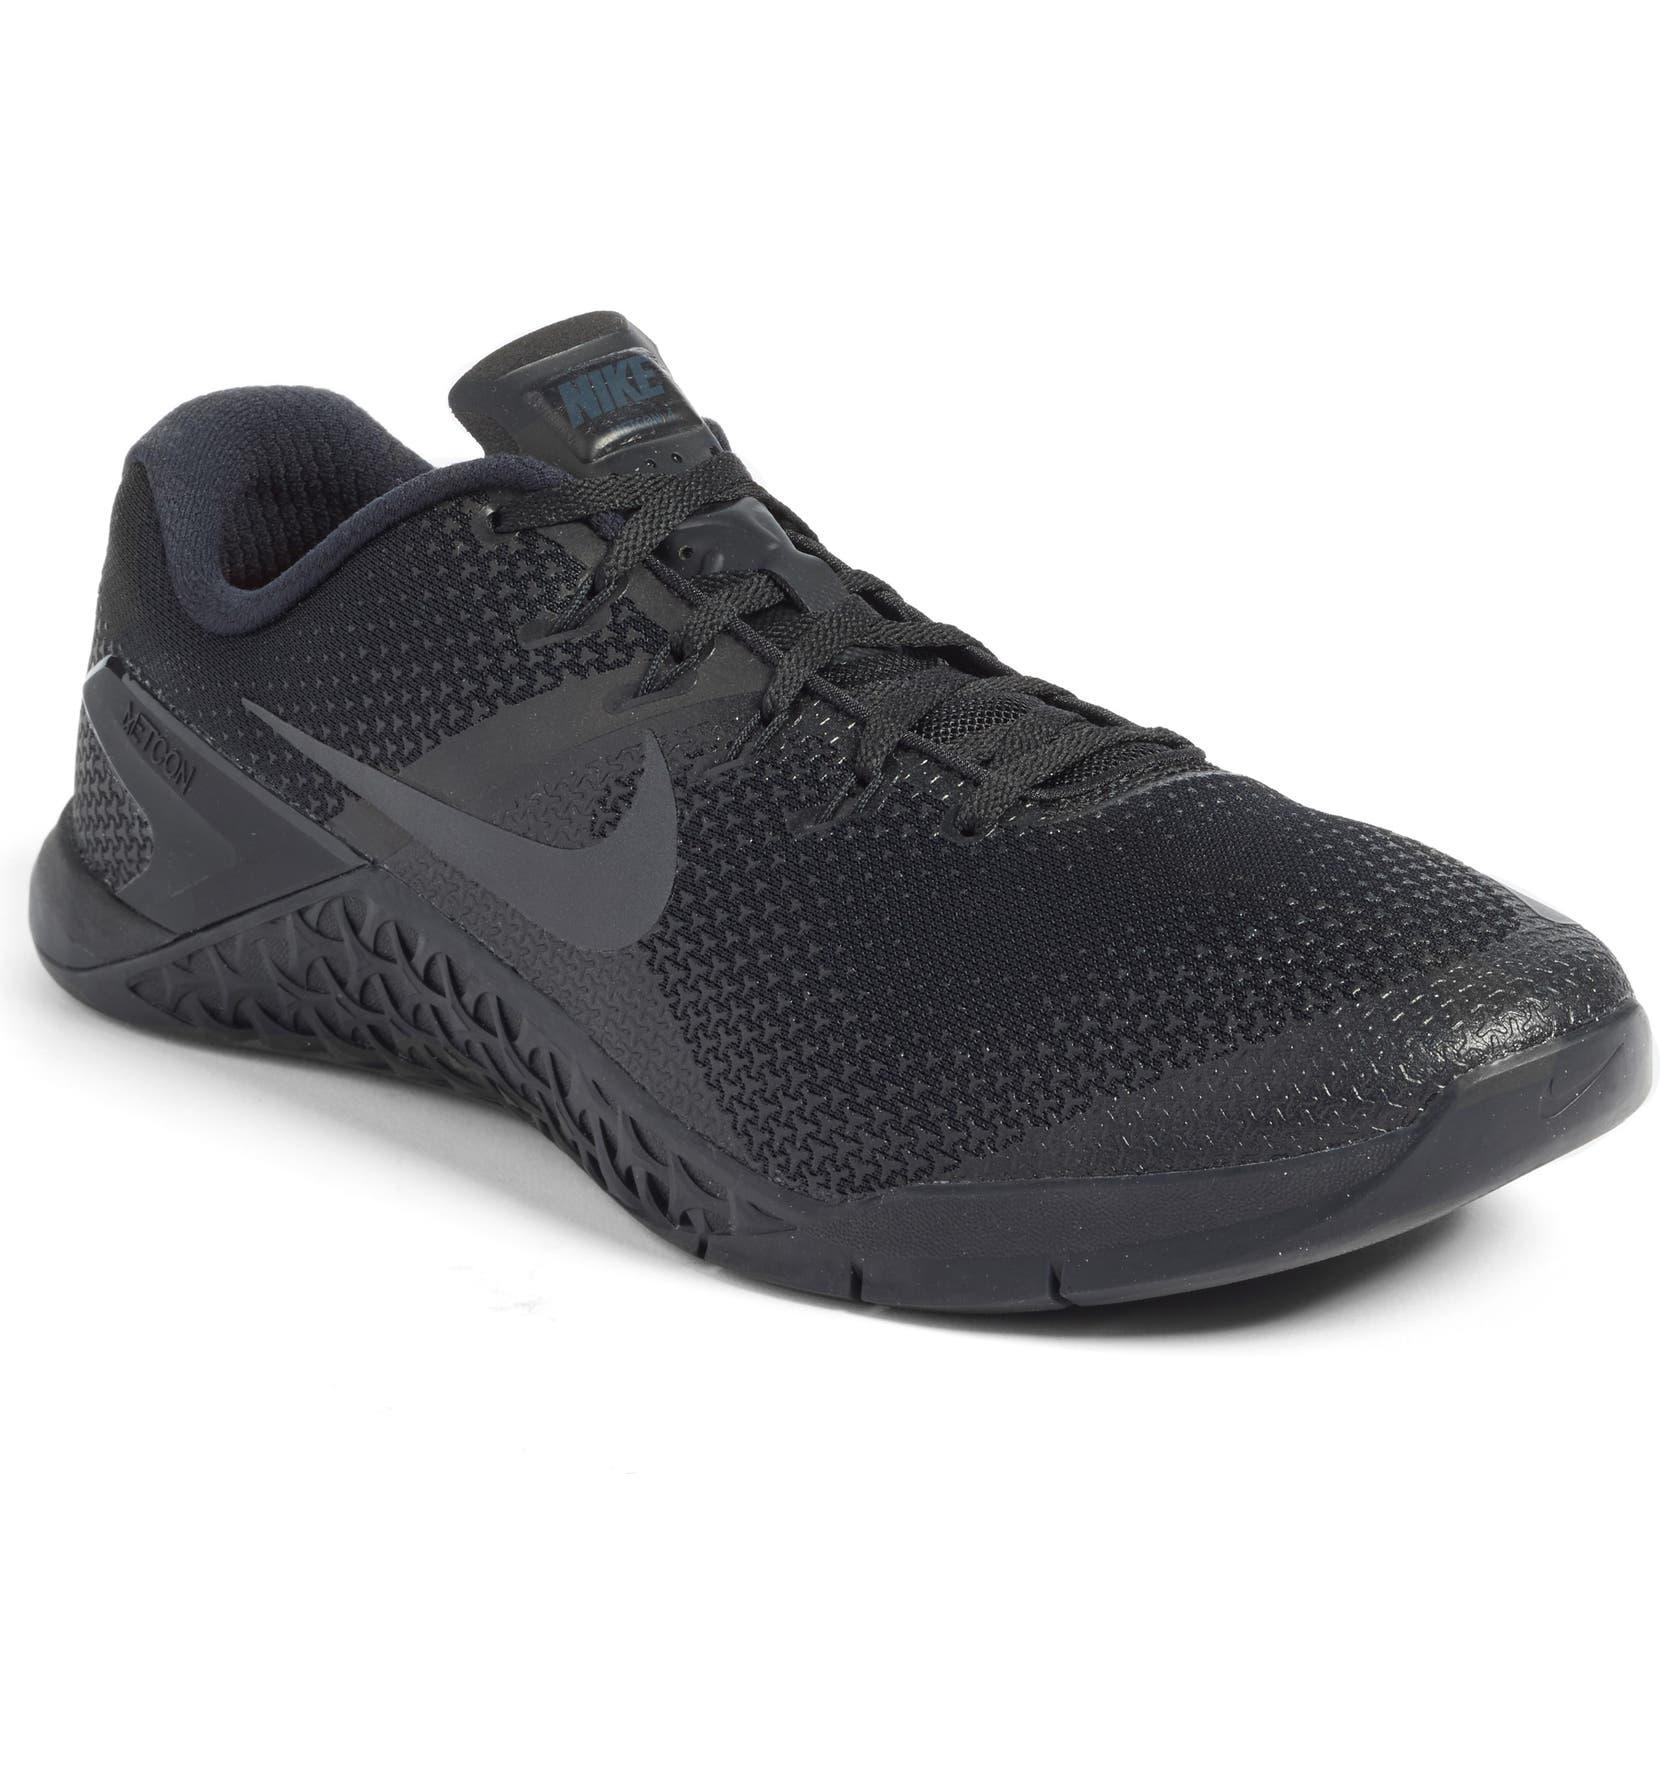 promo code ac0ea 38a2d Nike Metcon 4 Training Shoe (Men)  Nordstrom